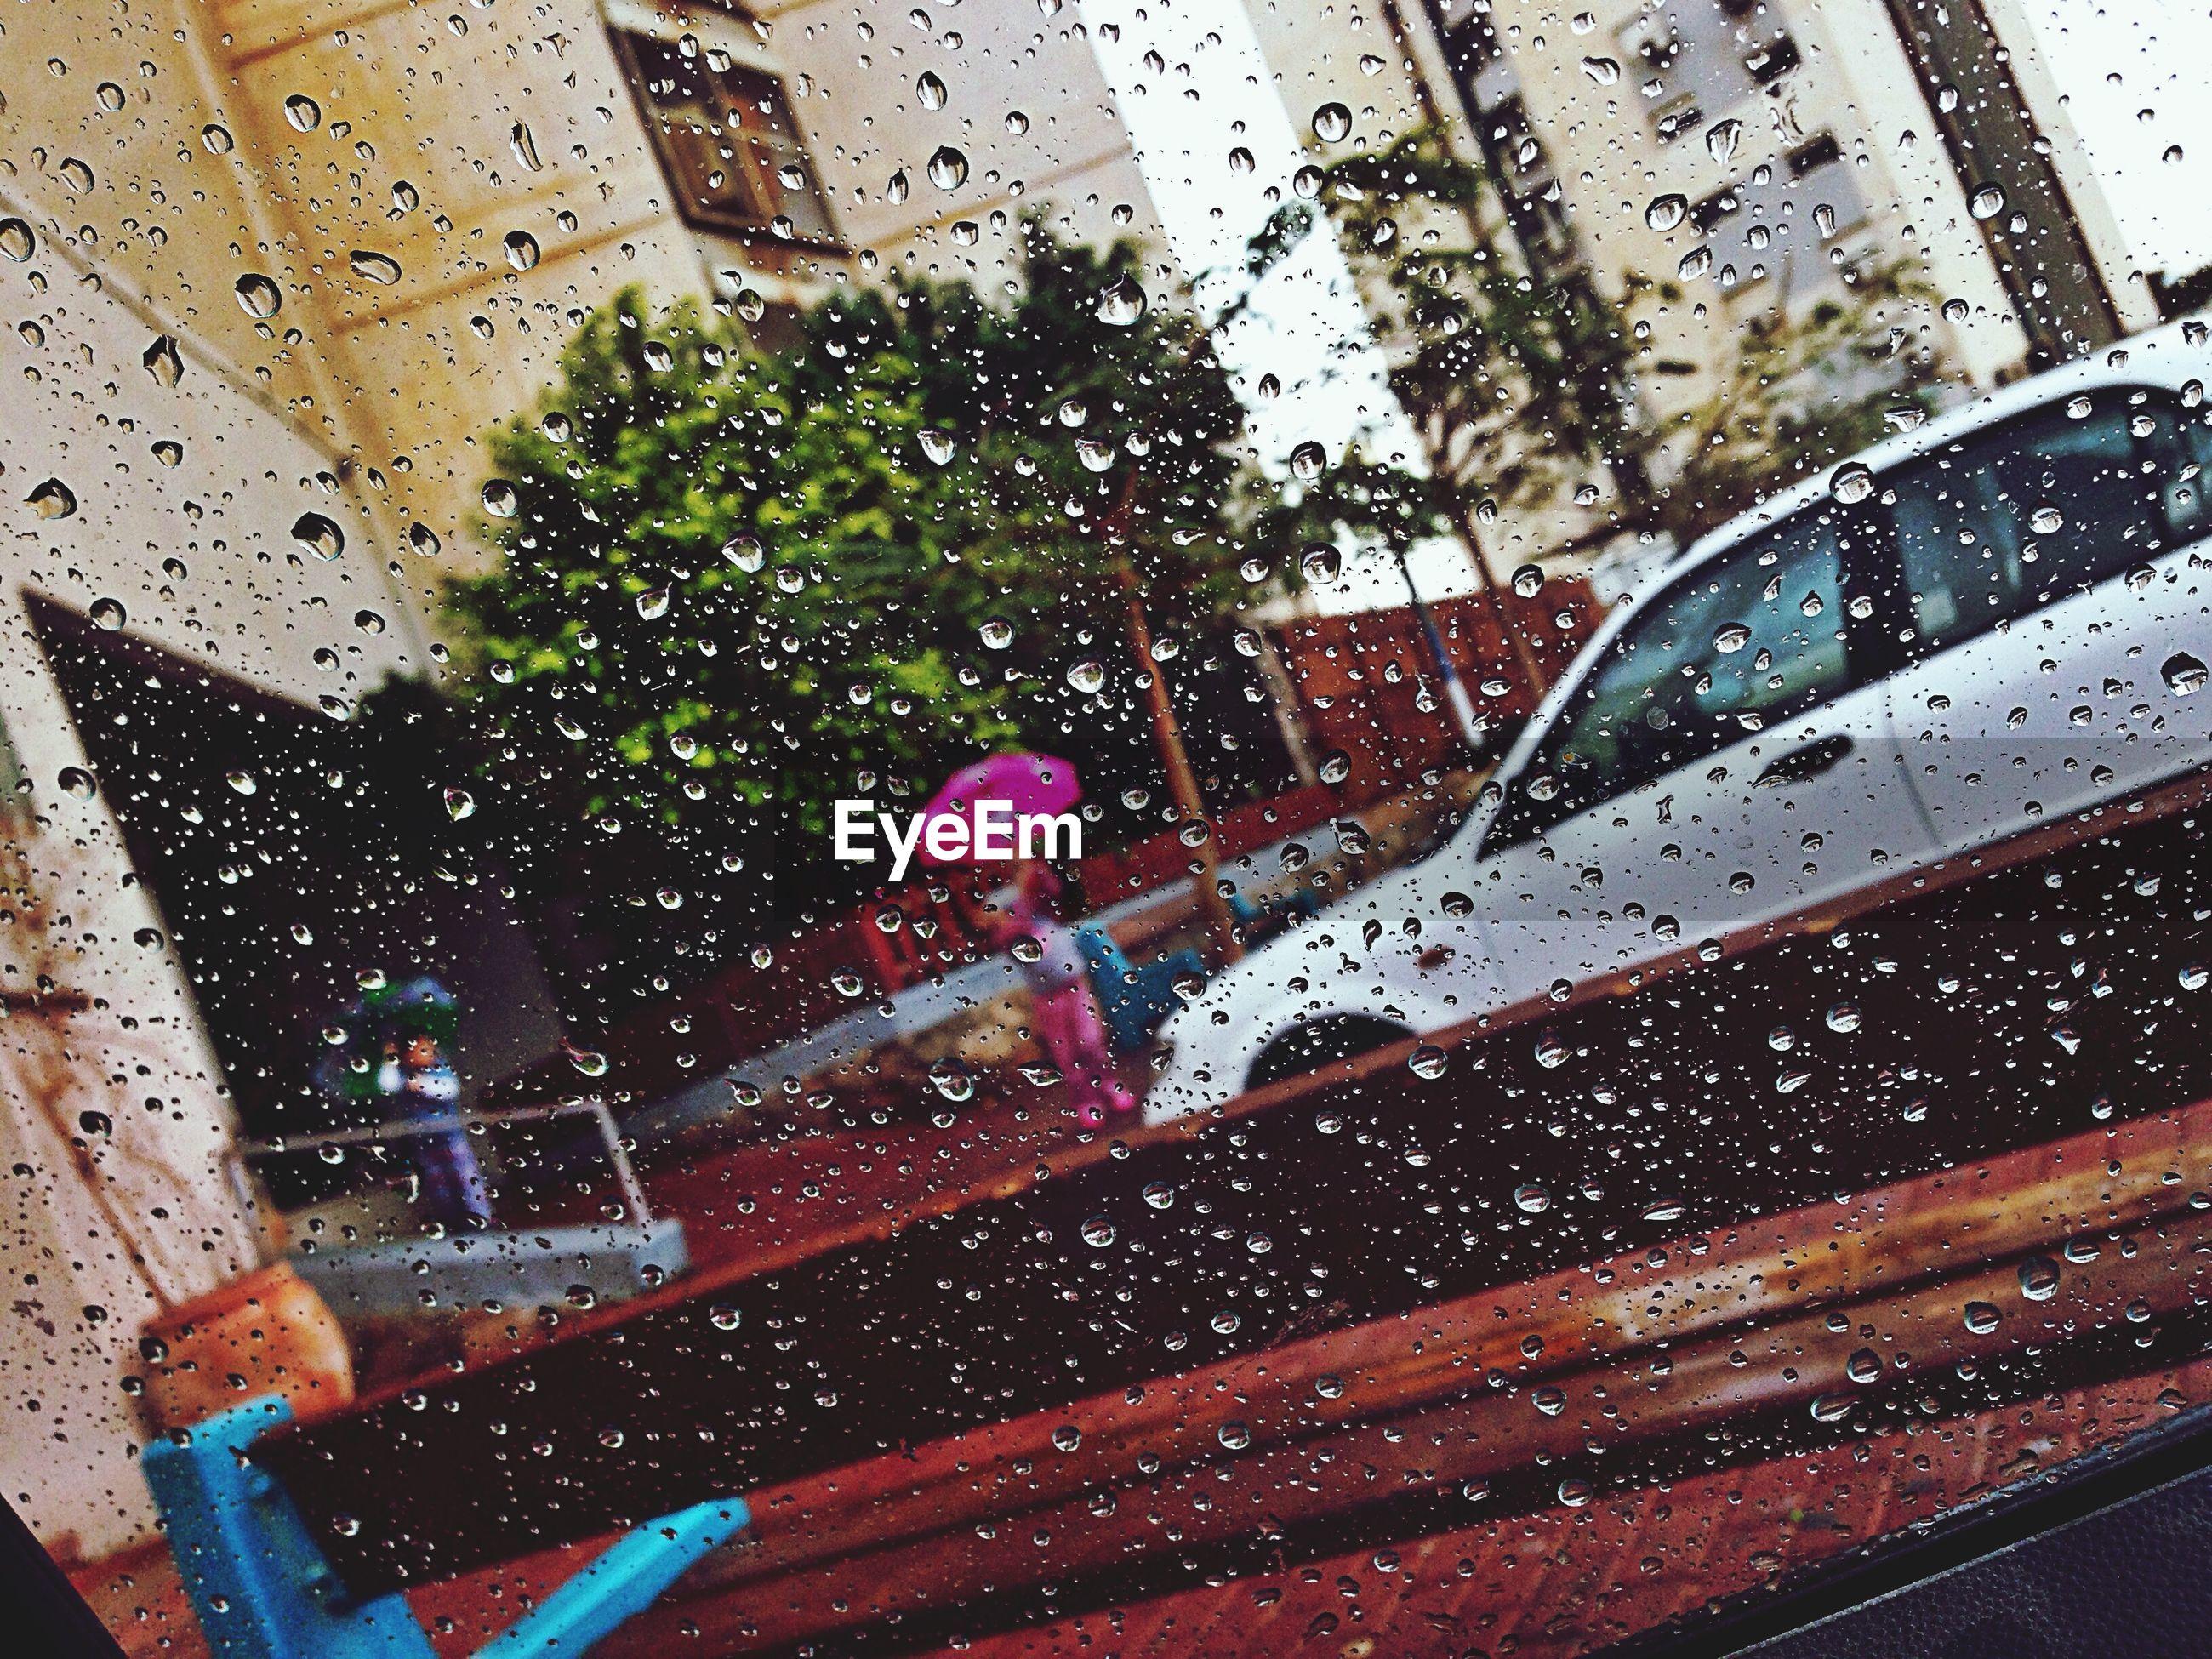 drop, water, wet, transparent, glass - material, rain, window, season, raindrop, indoors, glass, car, fragility, weather, building exterior, built structure, monsoon, day, architecture, rainy season